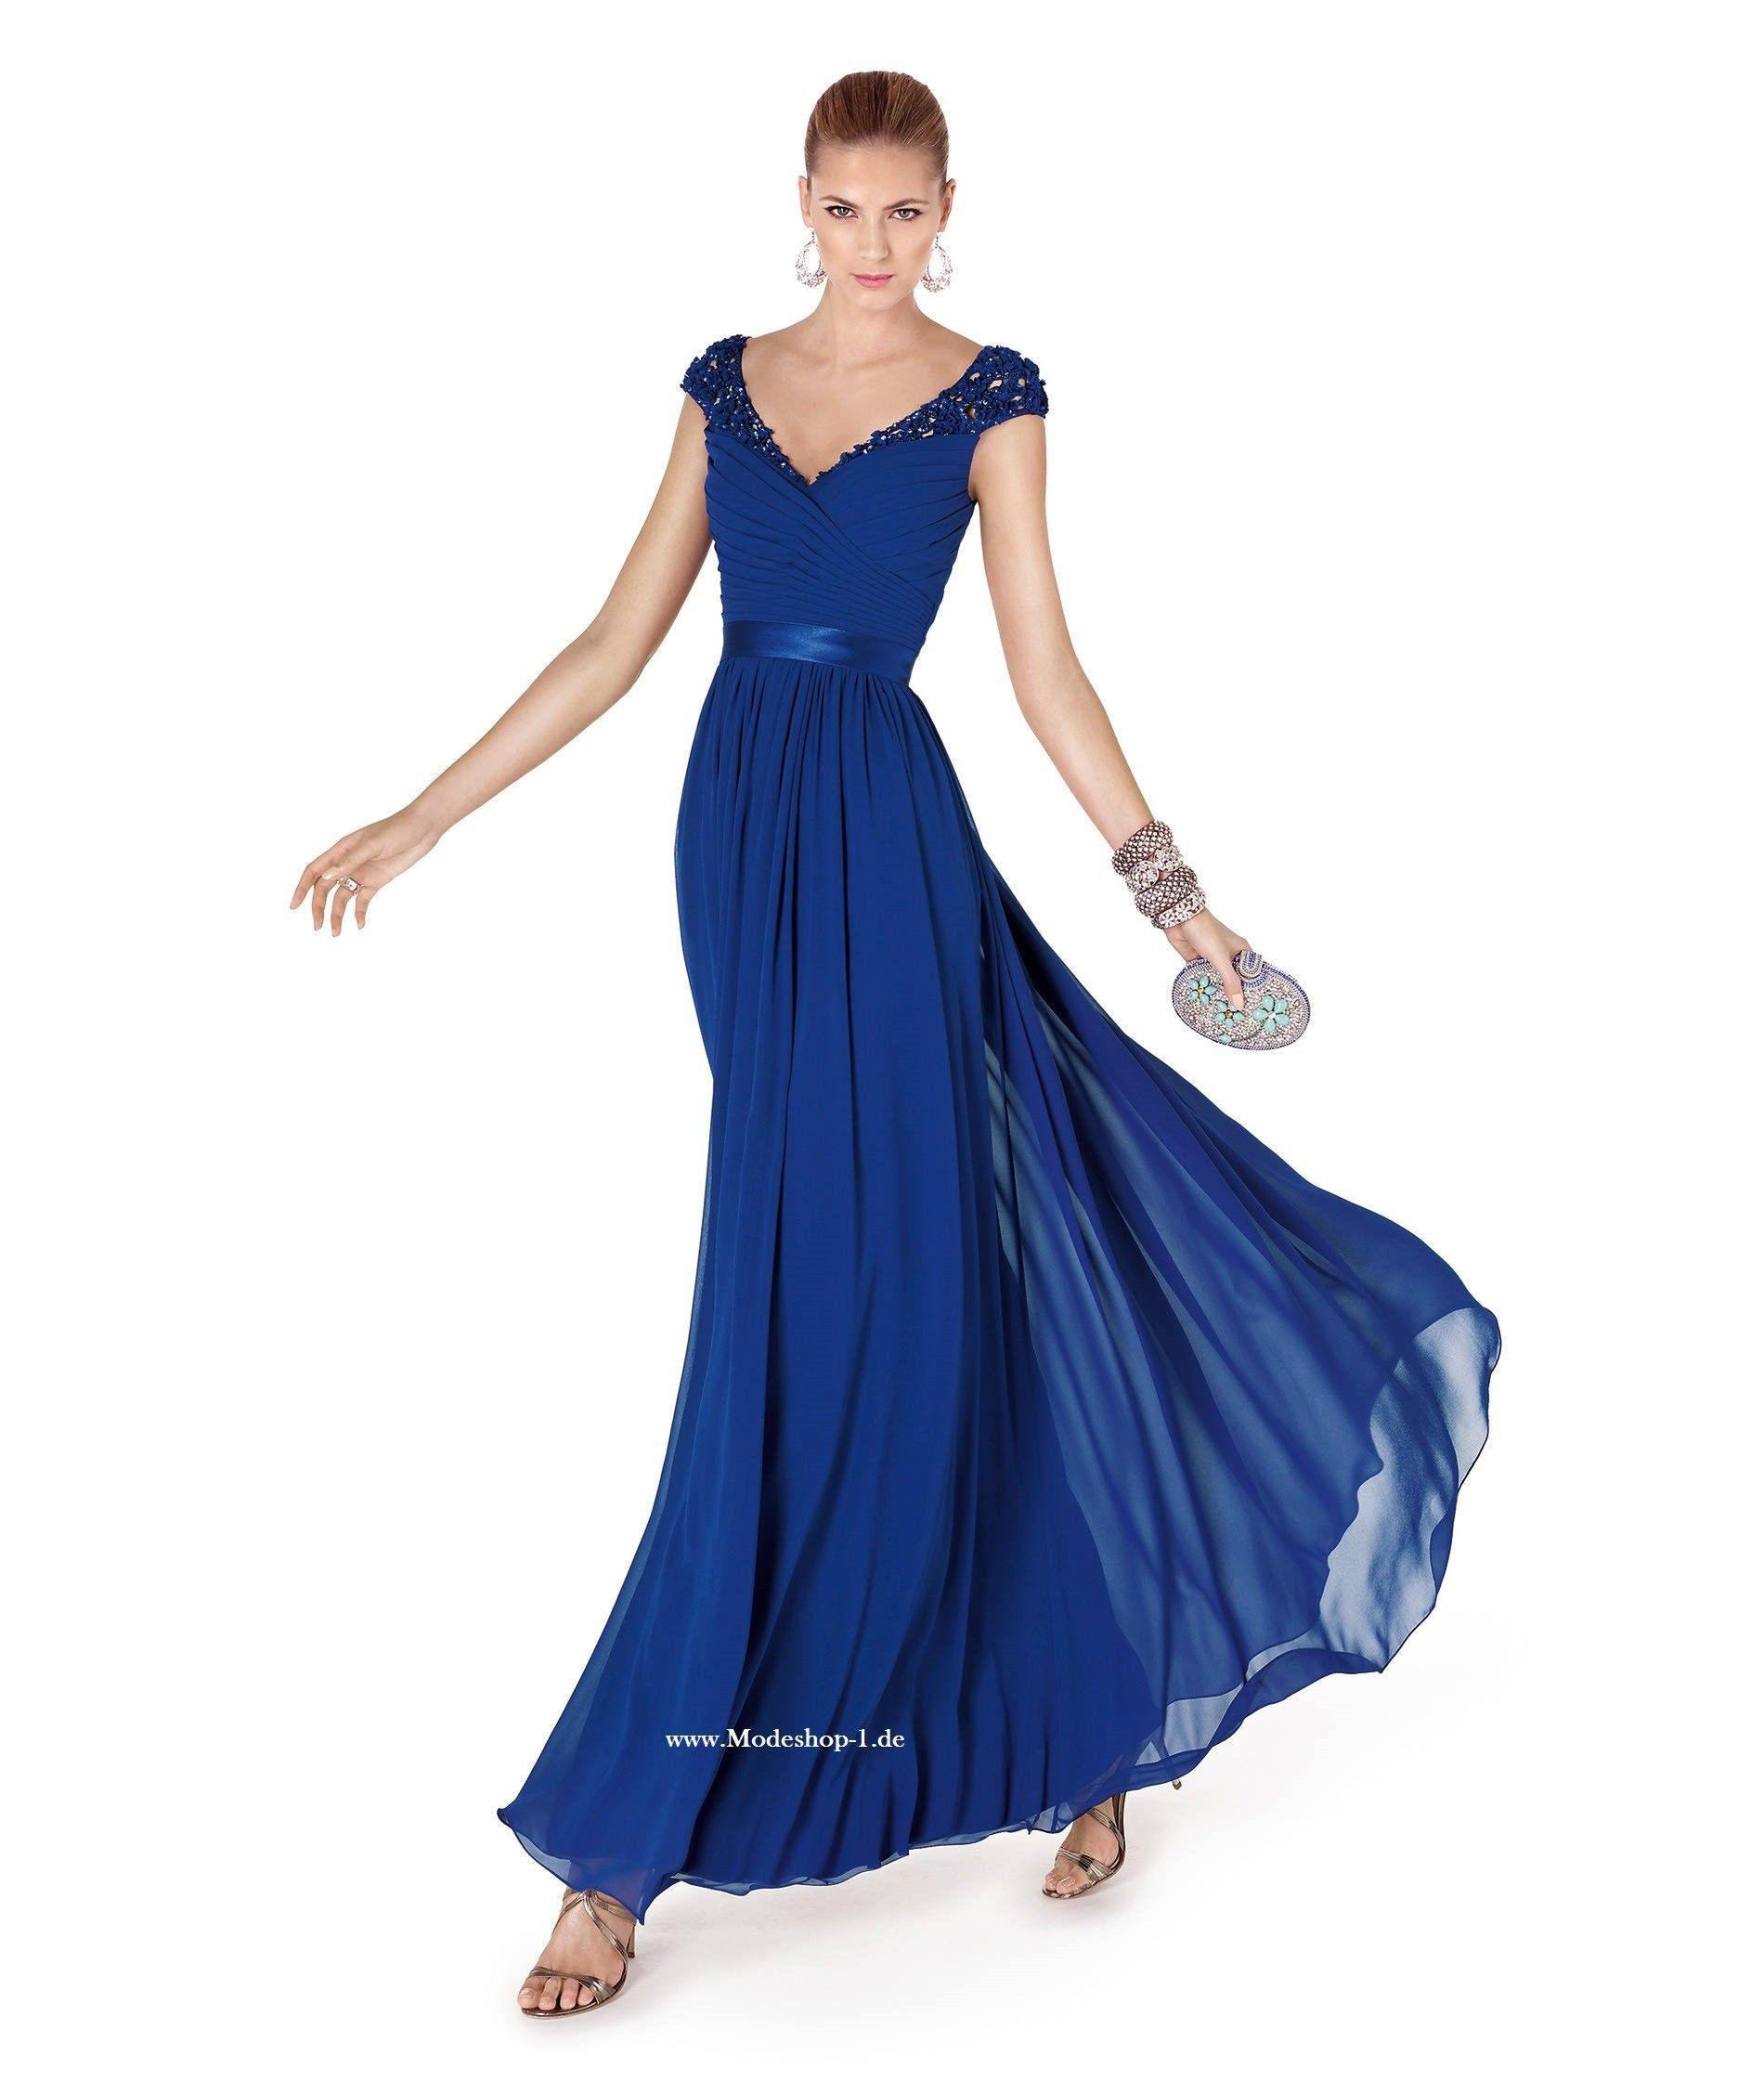 15 Perfekt Dunkelblaues Abendkleid Vertrieb20 Schön Dunkelblaues Abendkleid Spezialgebiet